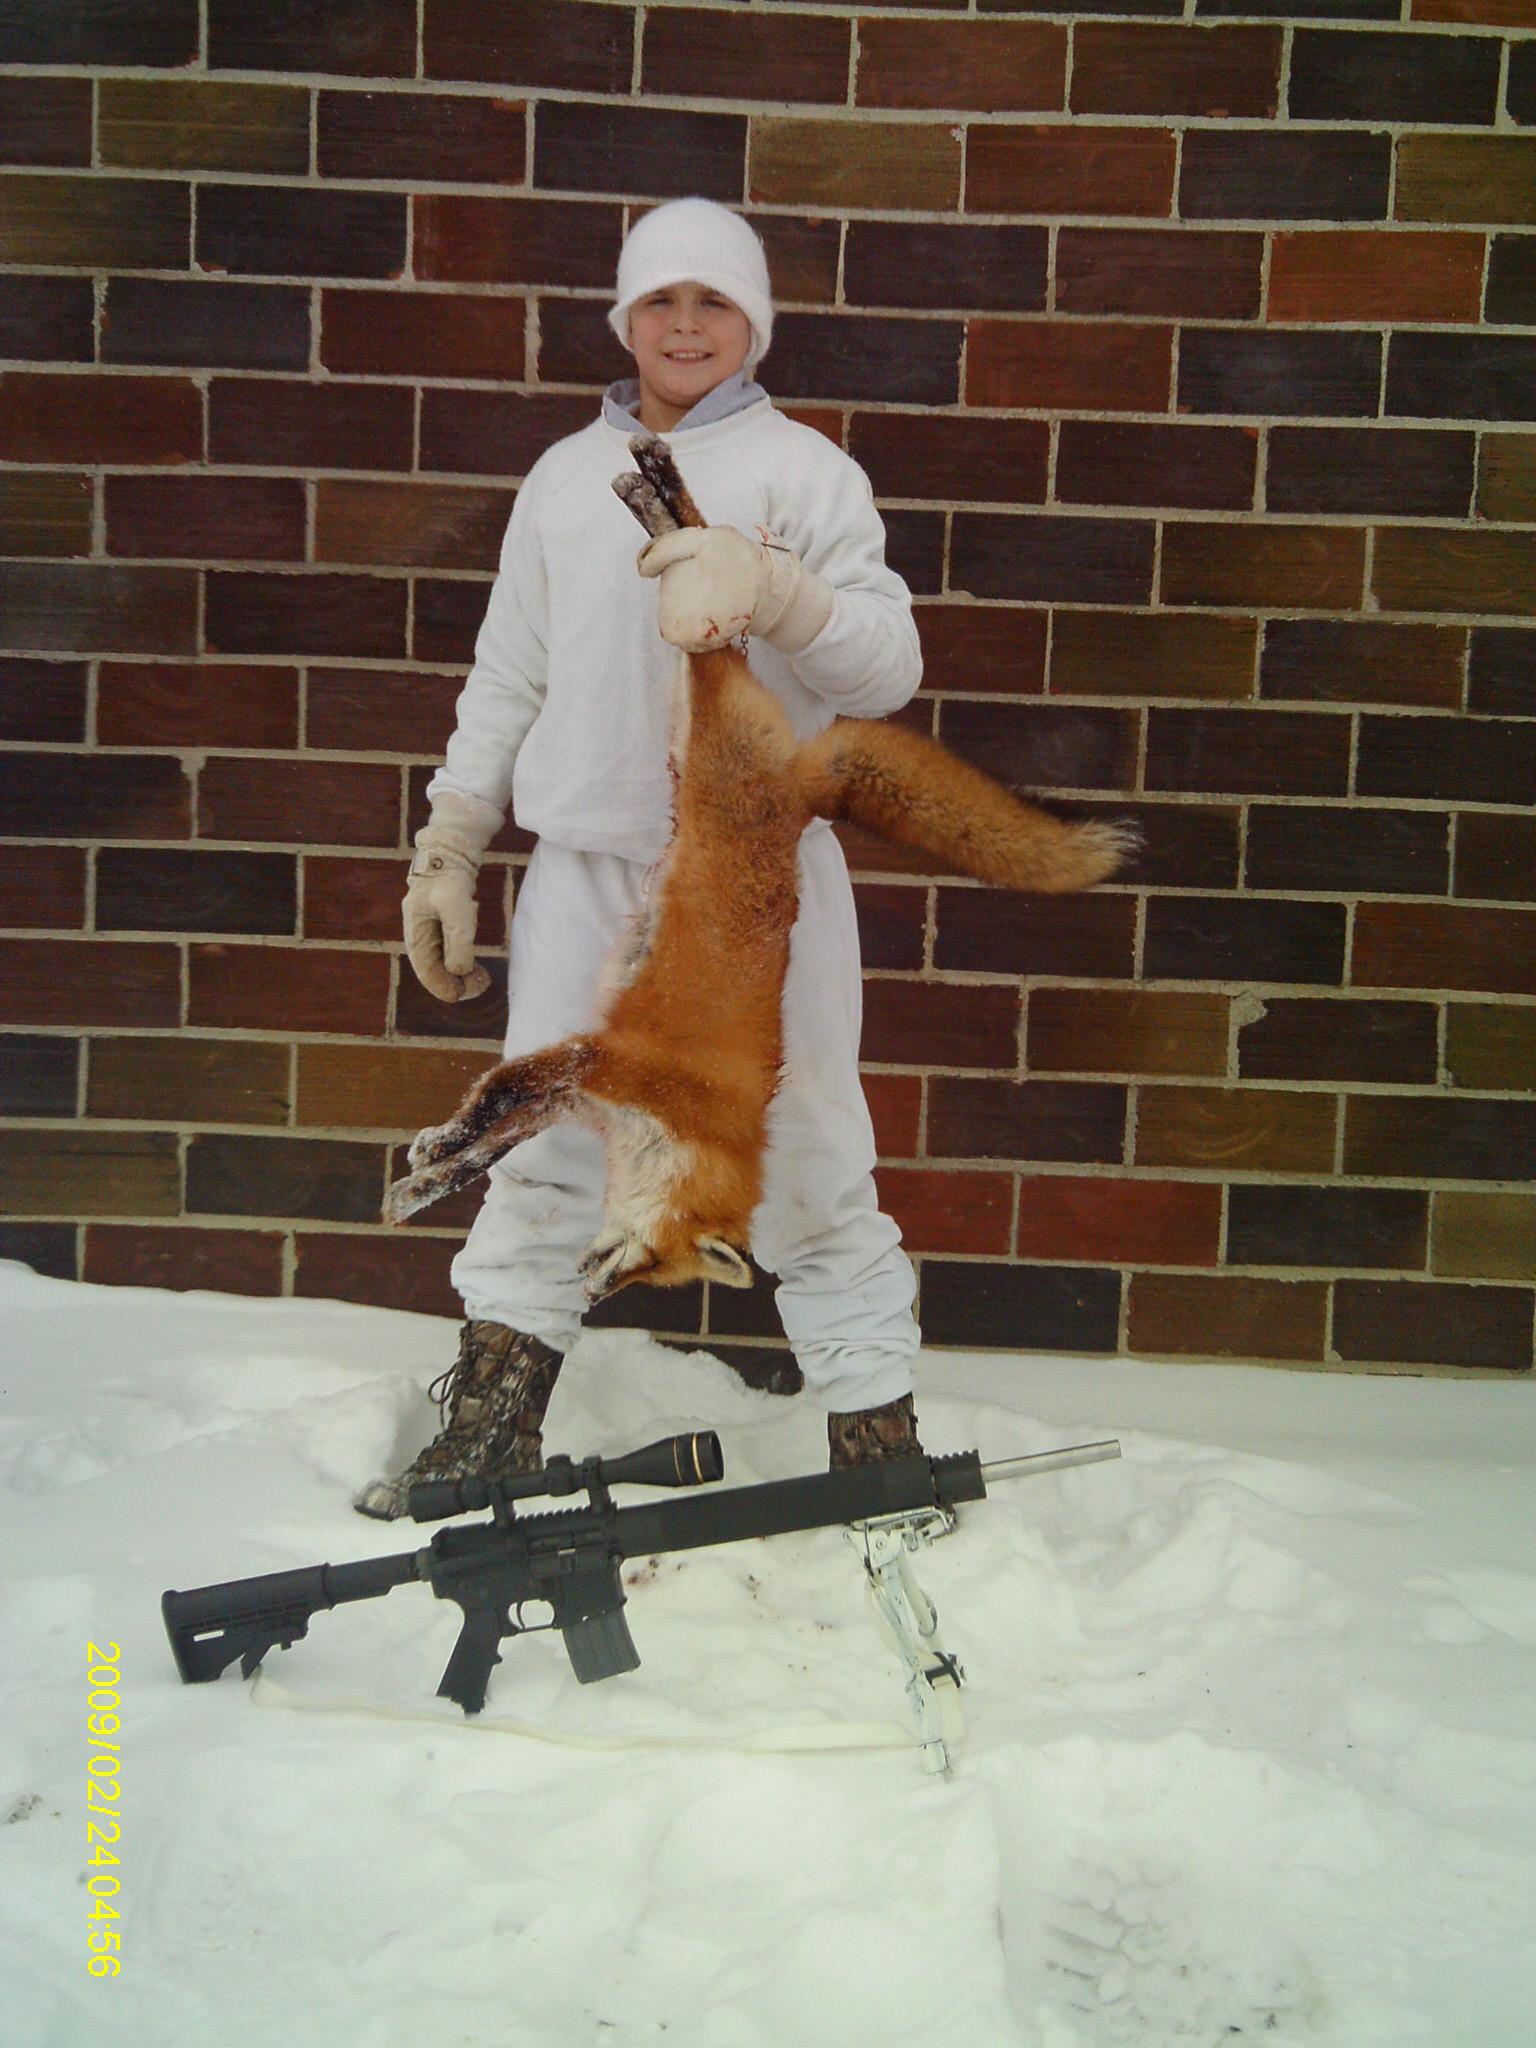 Fox Taken With Jard Trigger